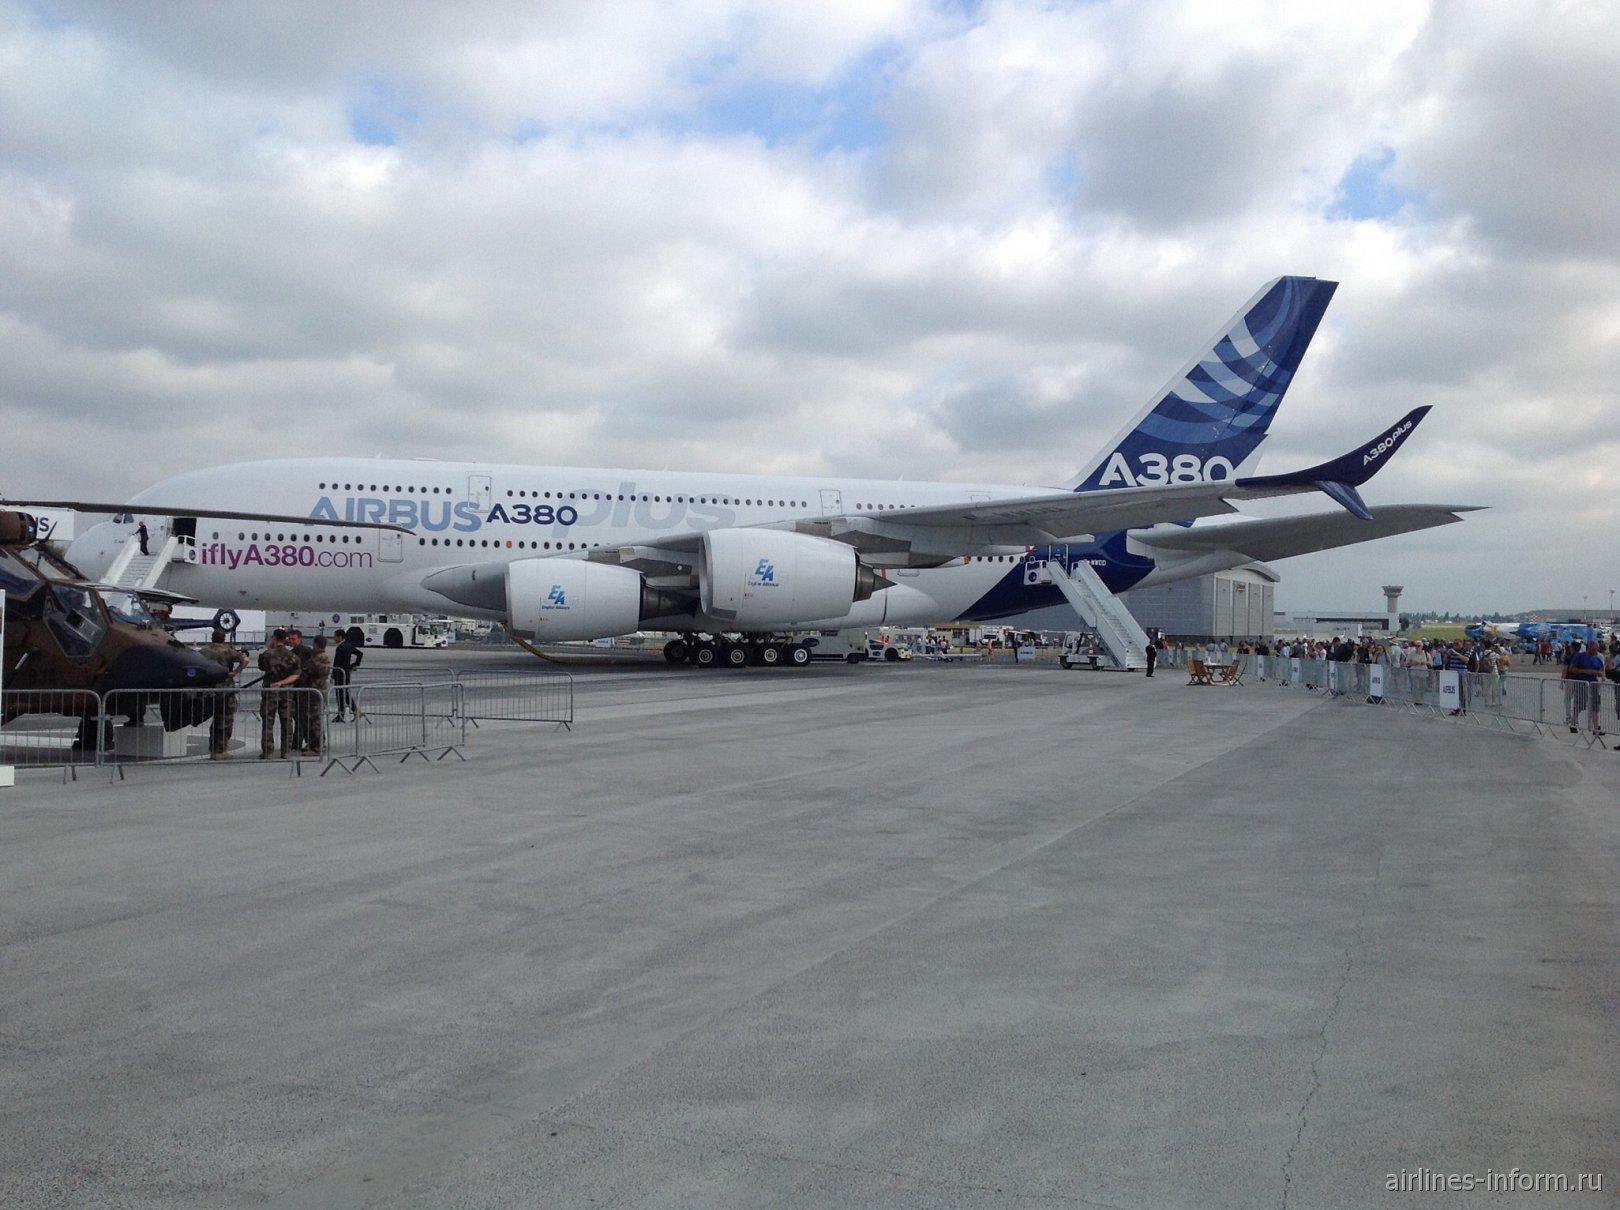 Самолет Airbus A380plus на авиасалоне в Ле-Бурже